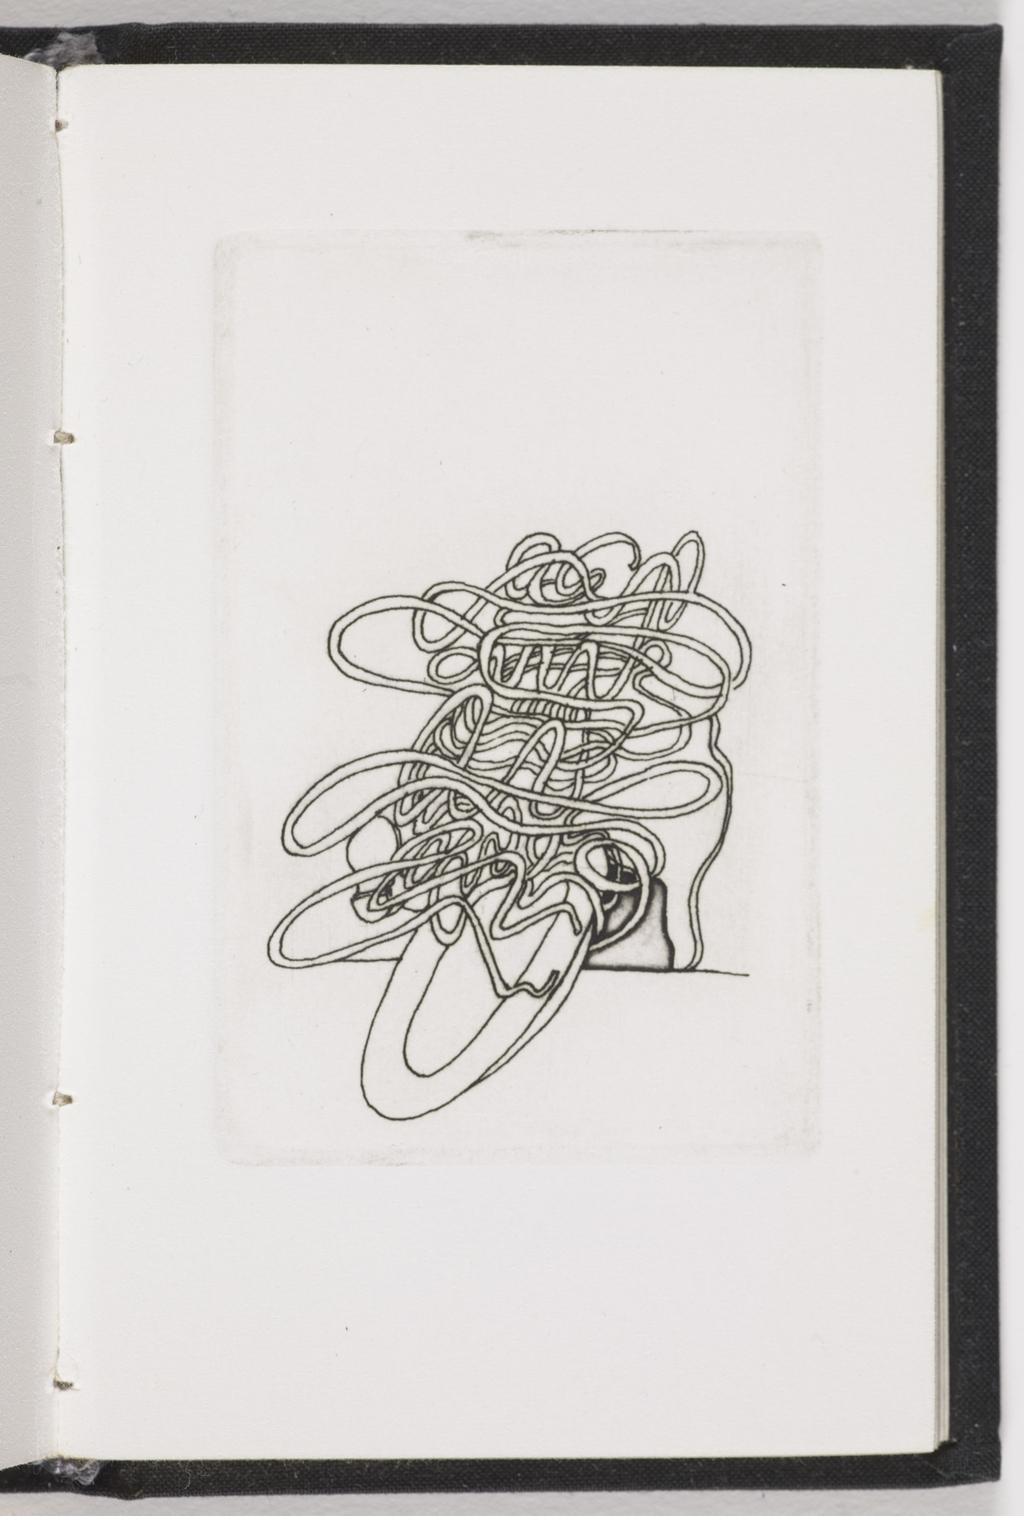 Ff ou i i i i ill è èye, du livre d'artiste «Spaghettata»